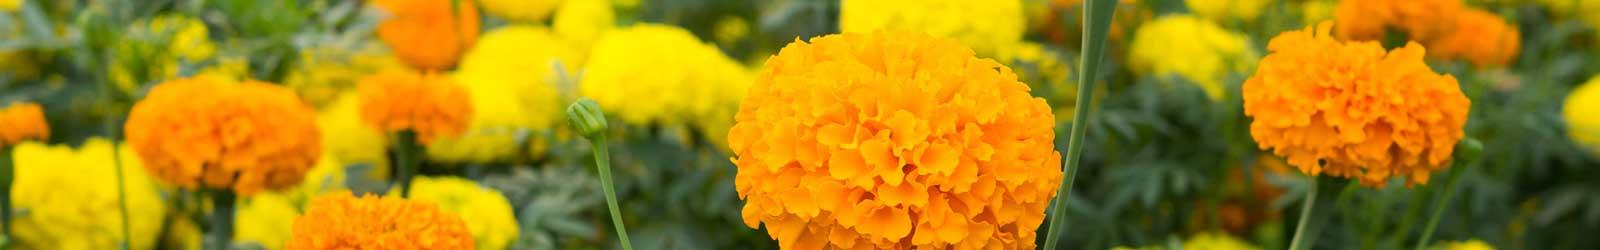 Events & Newsletters at Blossom Vale Senior Living in Orangevale, California.